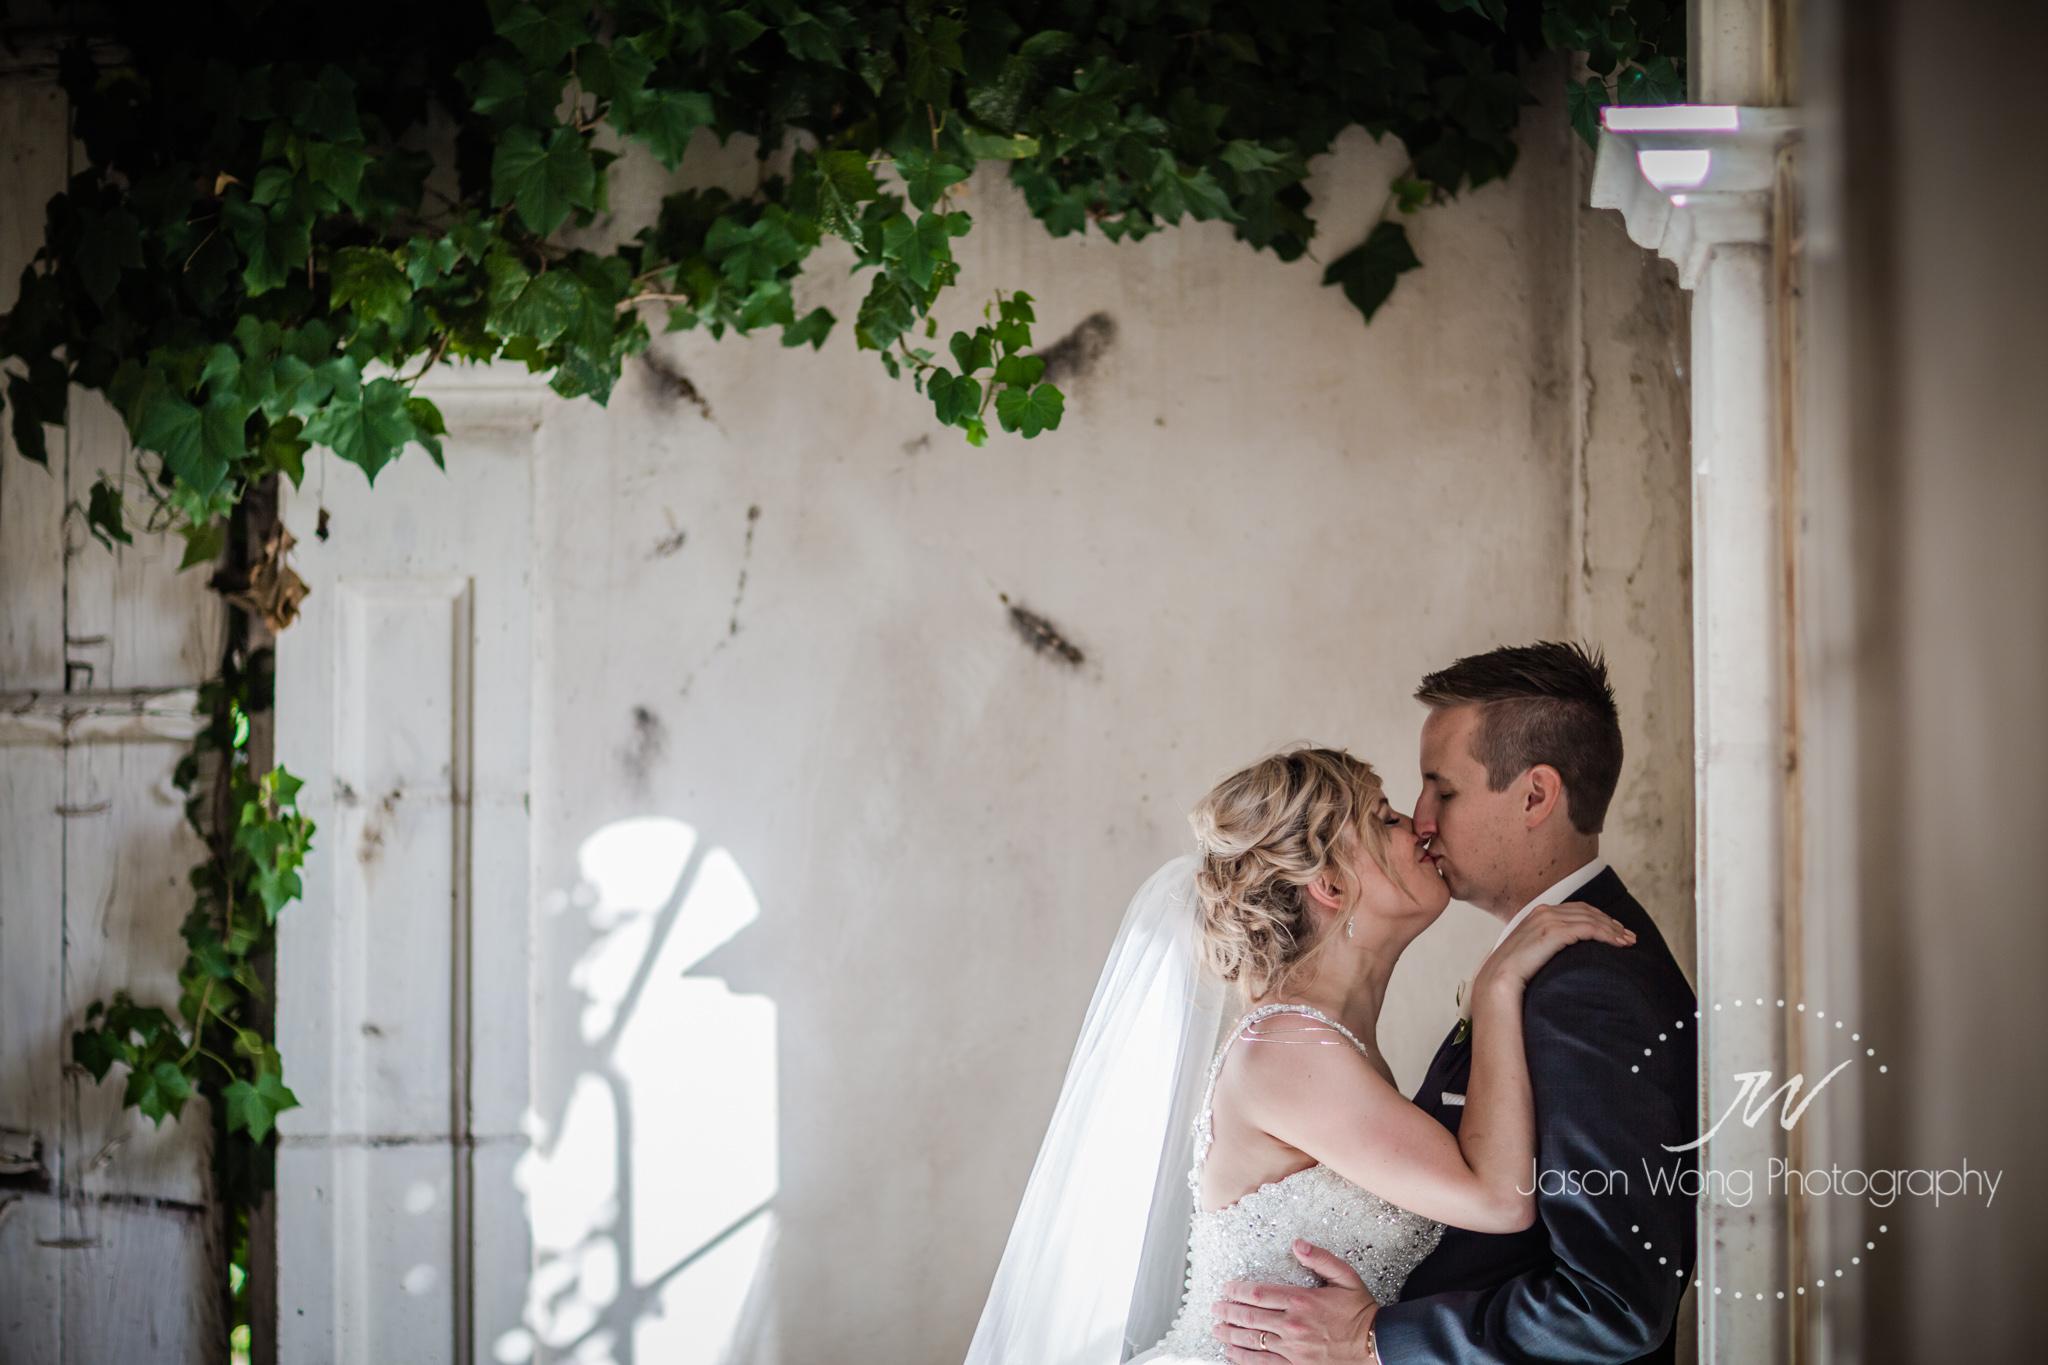 newlyweds-that-is-deeply-in-love.jpg